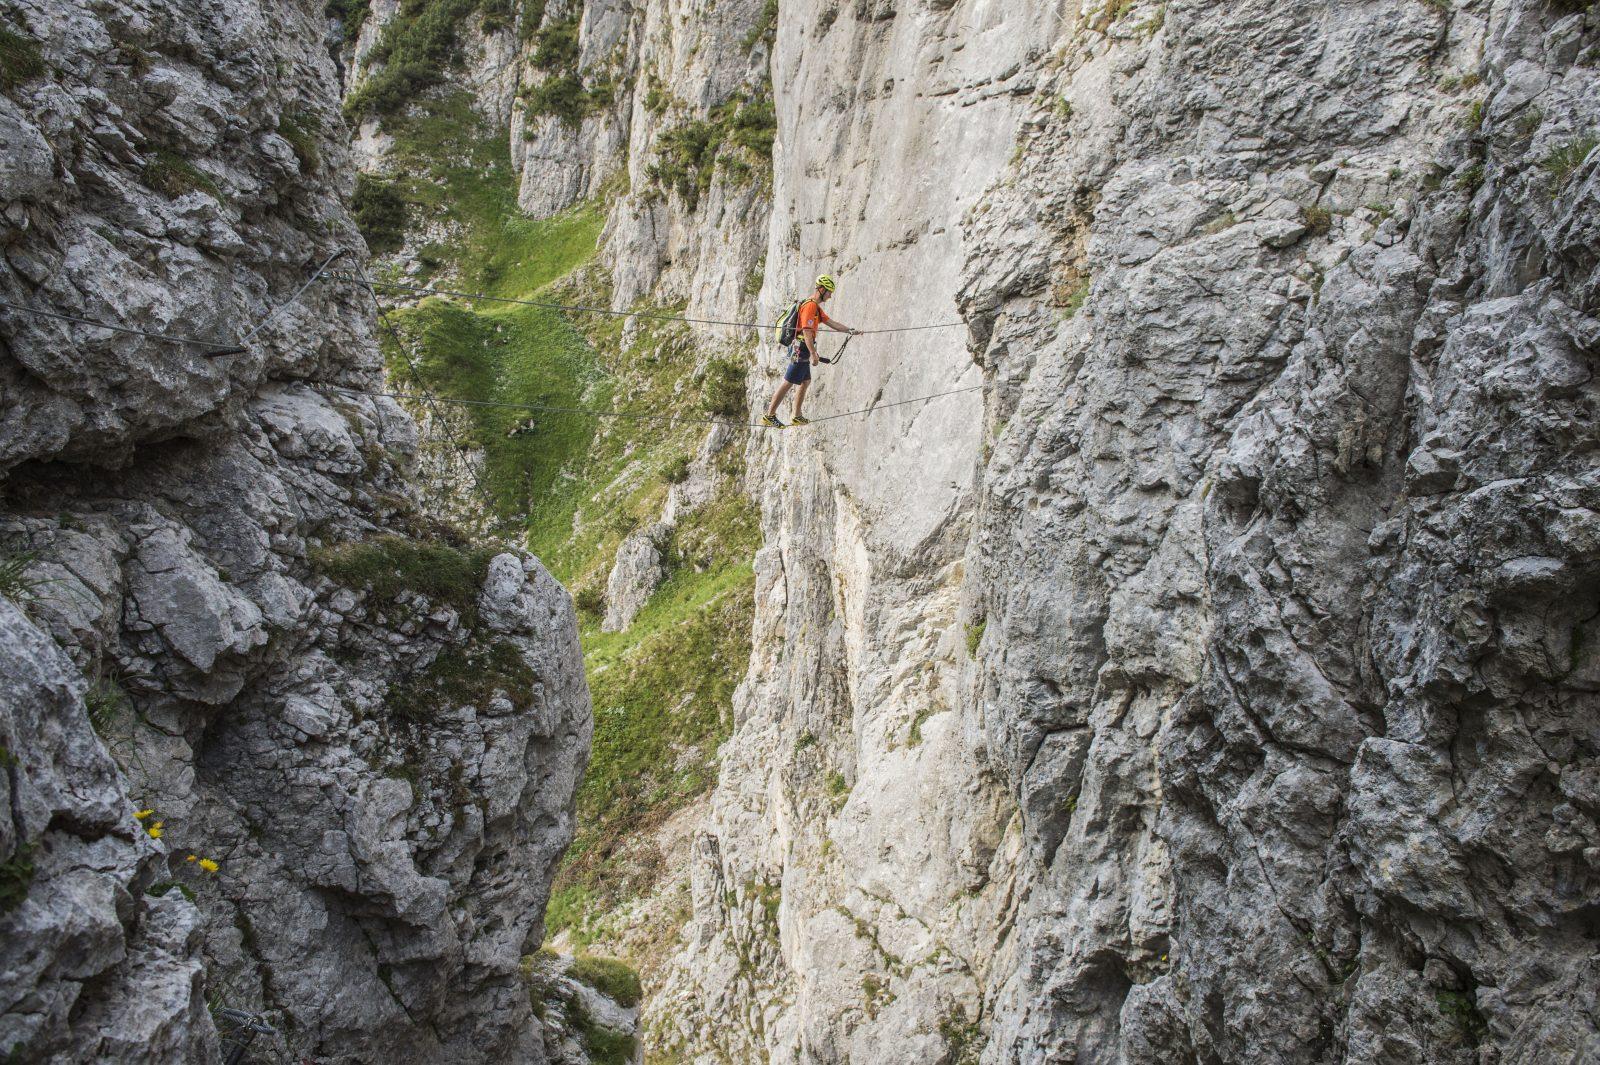 Hängebrücke im Klamml Klettersteig, Foto: Peter von Felbert | Climbers Paradise